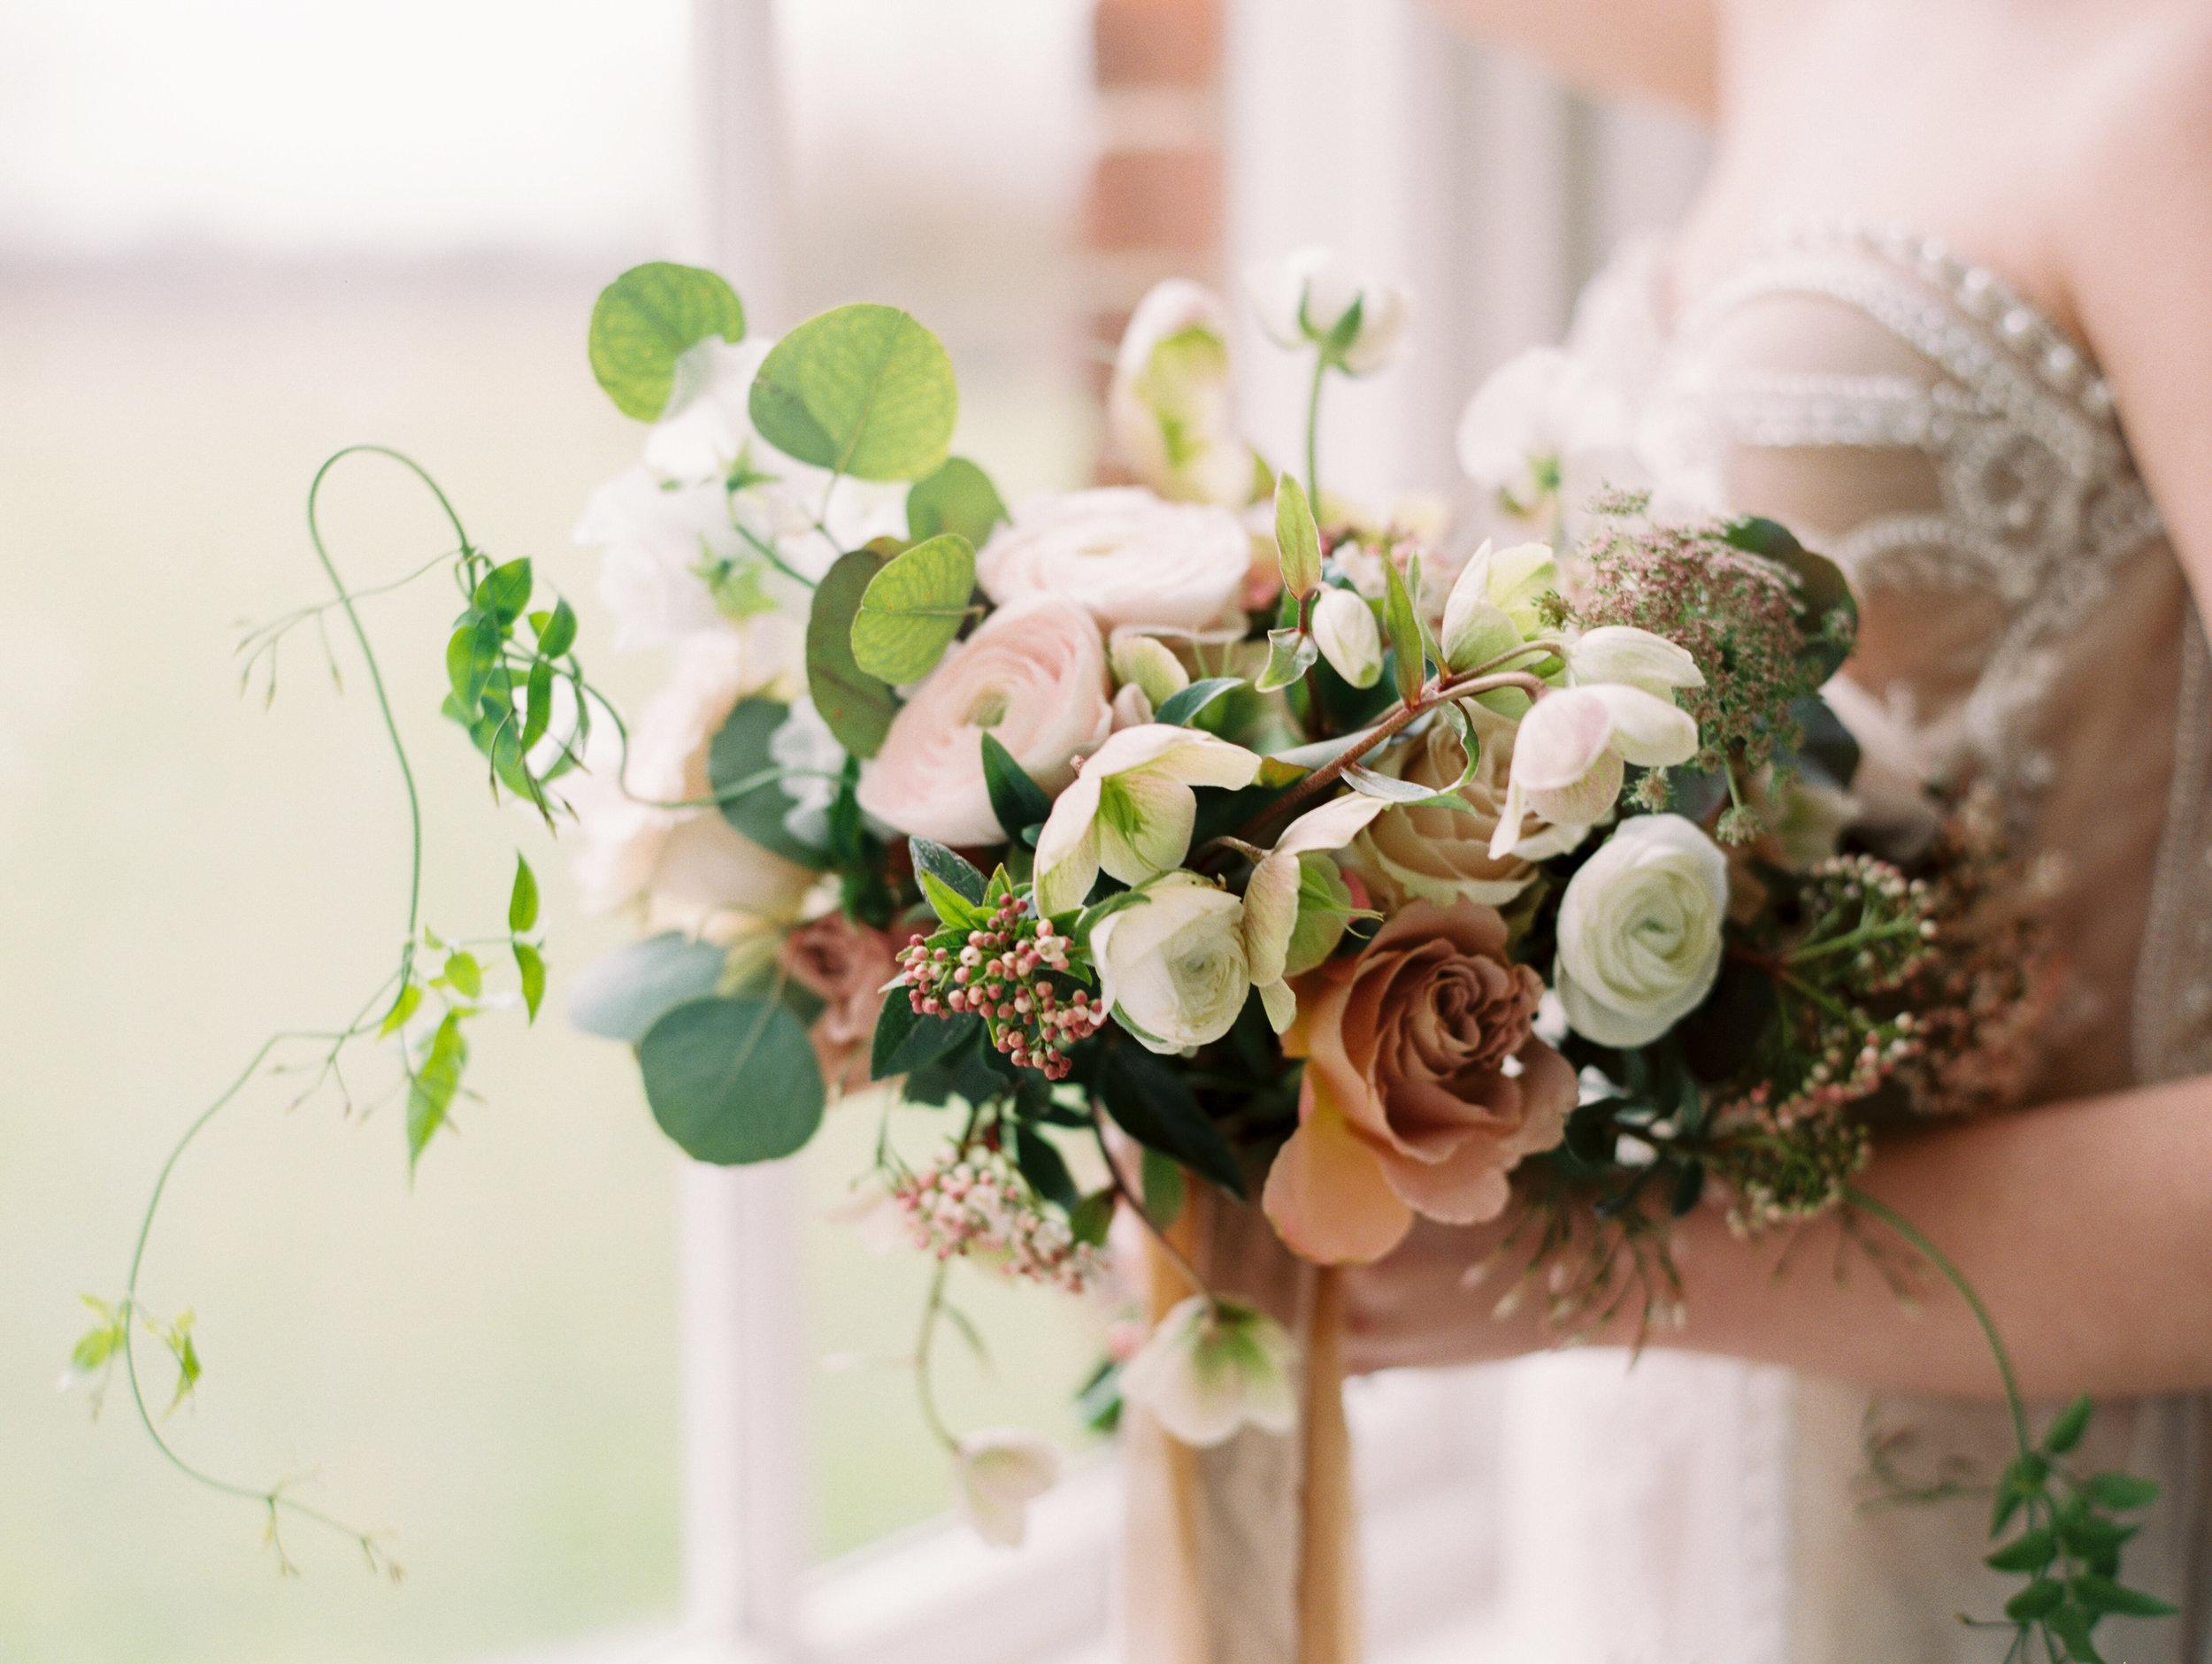 The Timeless Stylist-Elegant and Romantic Wedding Styling-Elegant Neutral Palette Wedding Bouquet.jpg